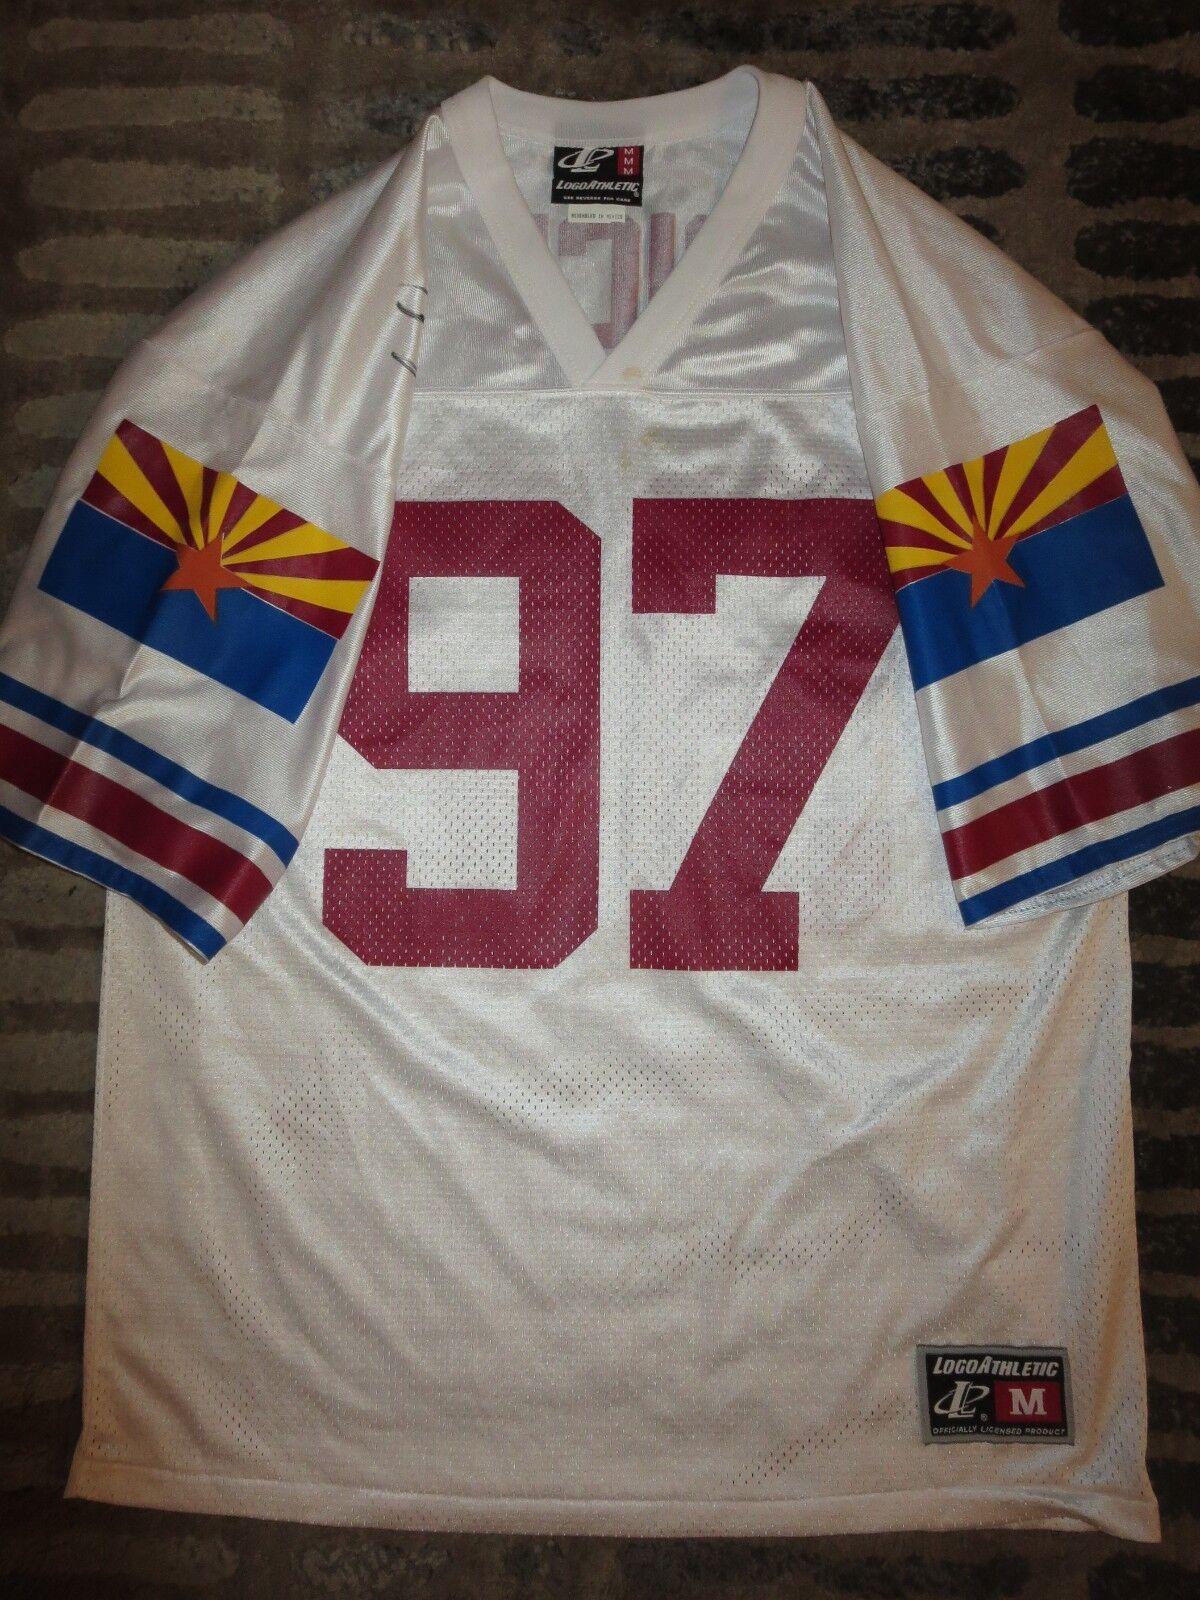 Simeon Rice Arizona Cardinals NFL Camiseta de Fútbol M Autógrafo Firmado